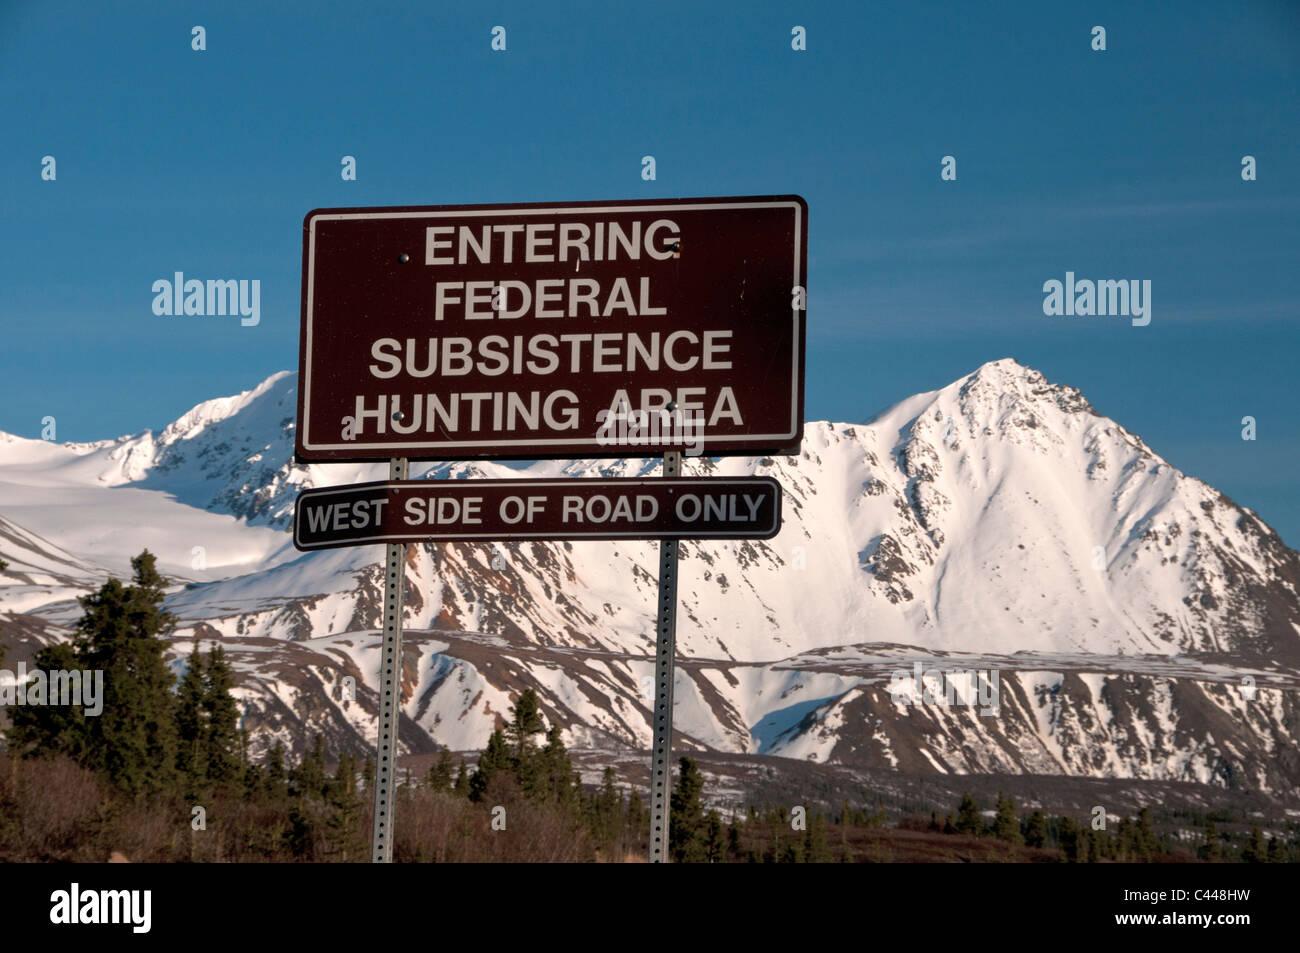 federal subsistence hunting area, sign, Denali Highway, Alaska, North America, board, USA, mountains, snow, hunting - Stock Image